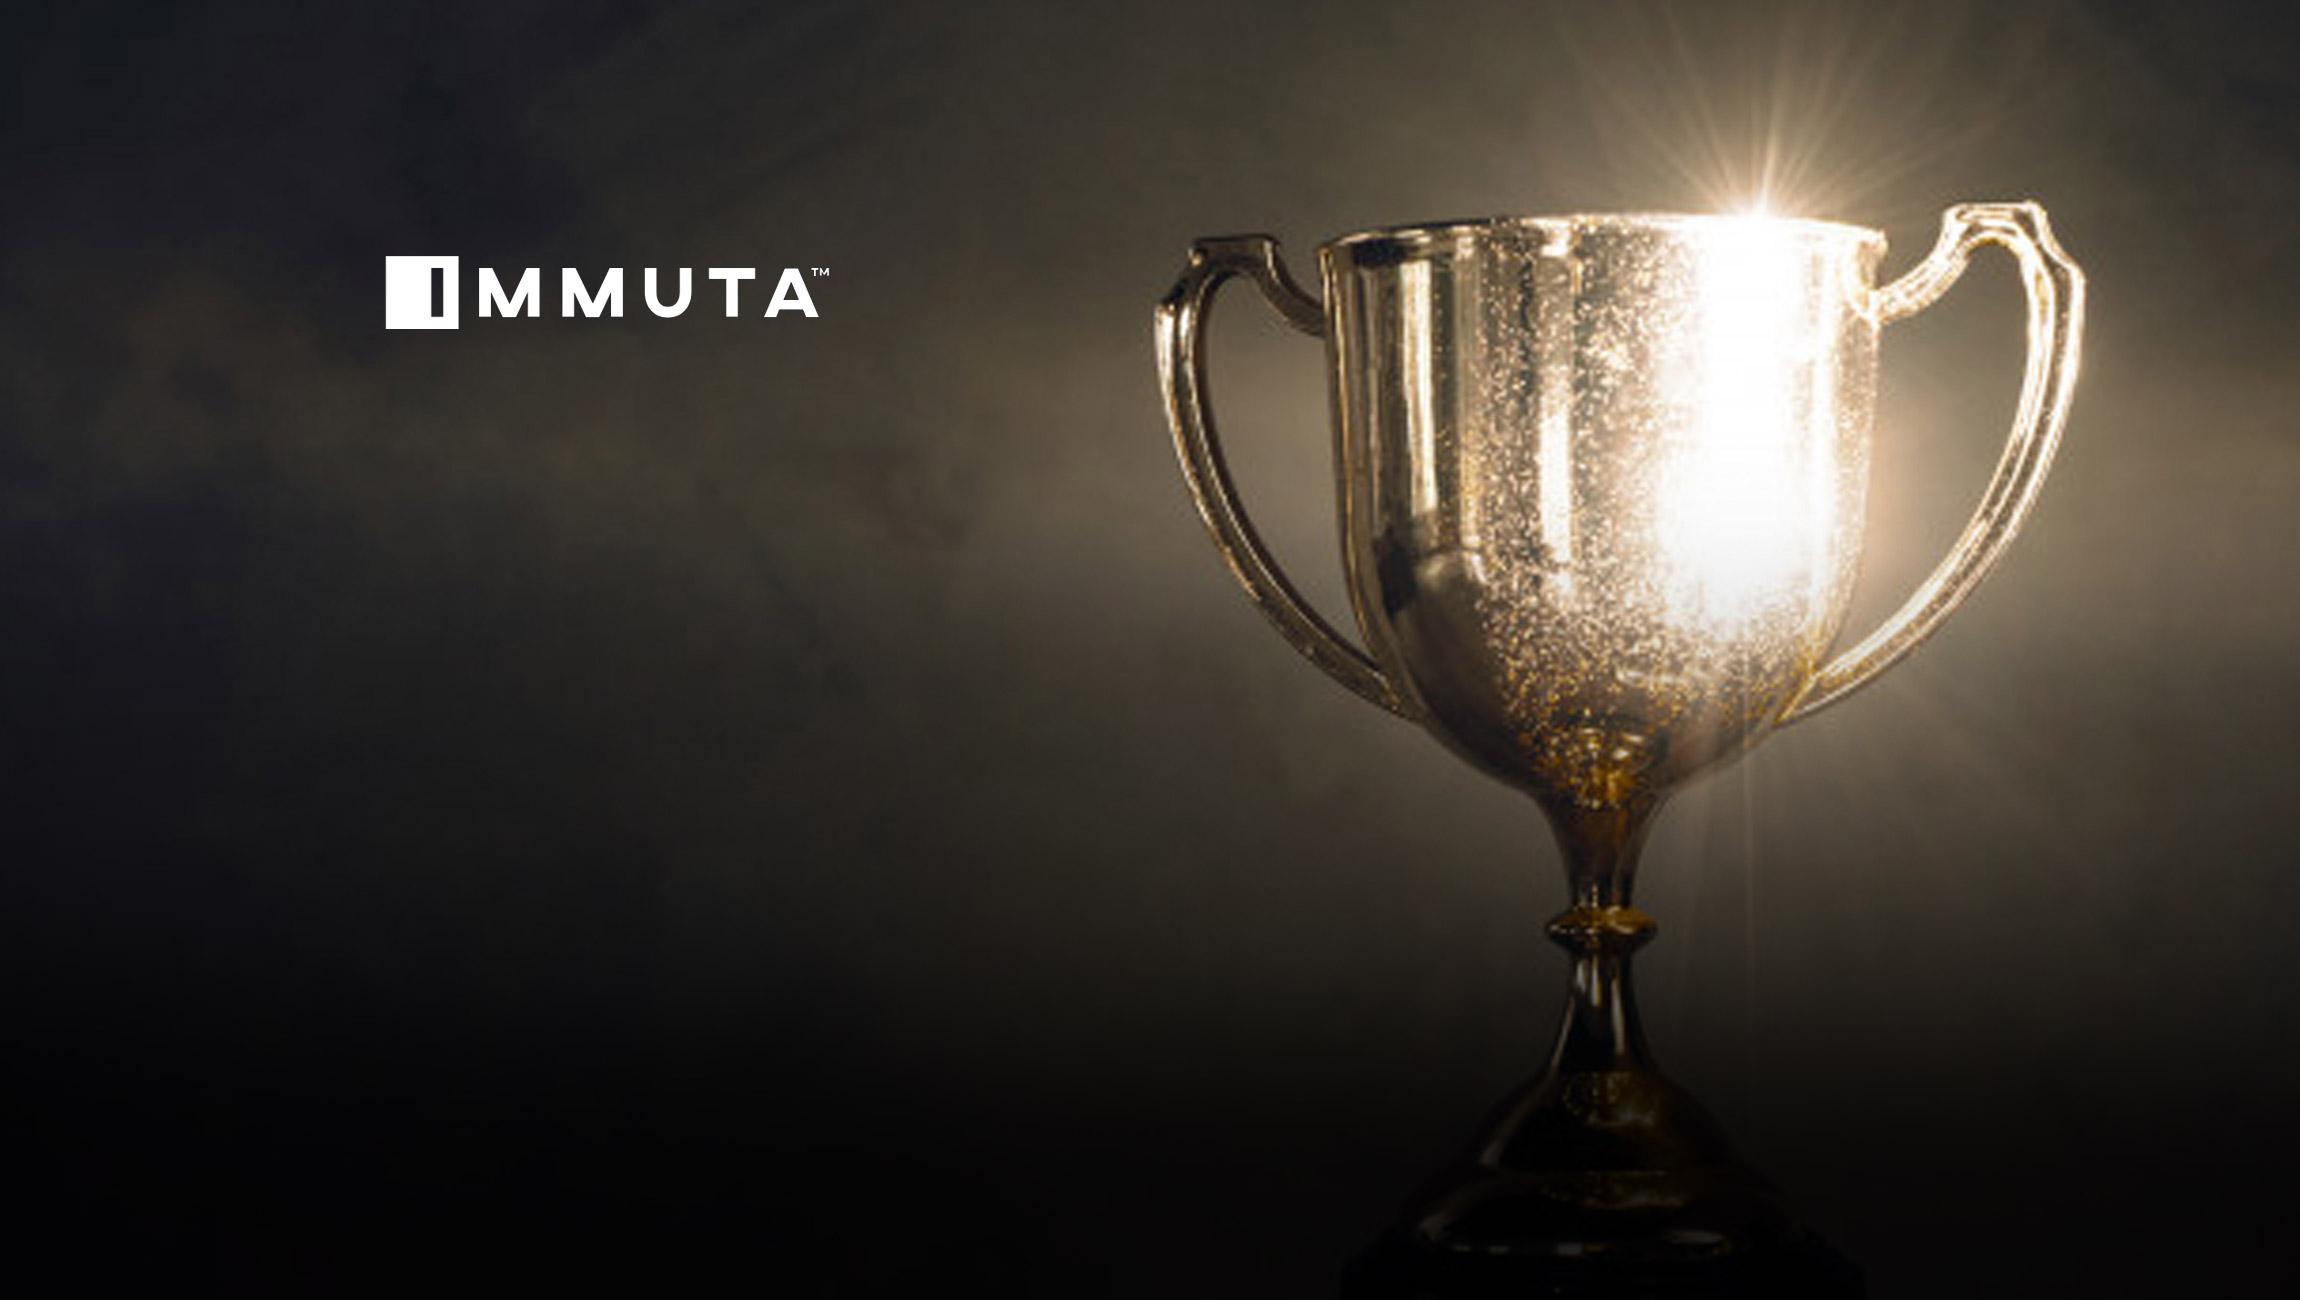 Credit-Suisse-Names-Immuta-a-Disruptive-Technology-Award-Winner